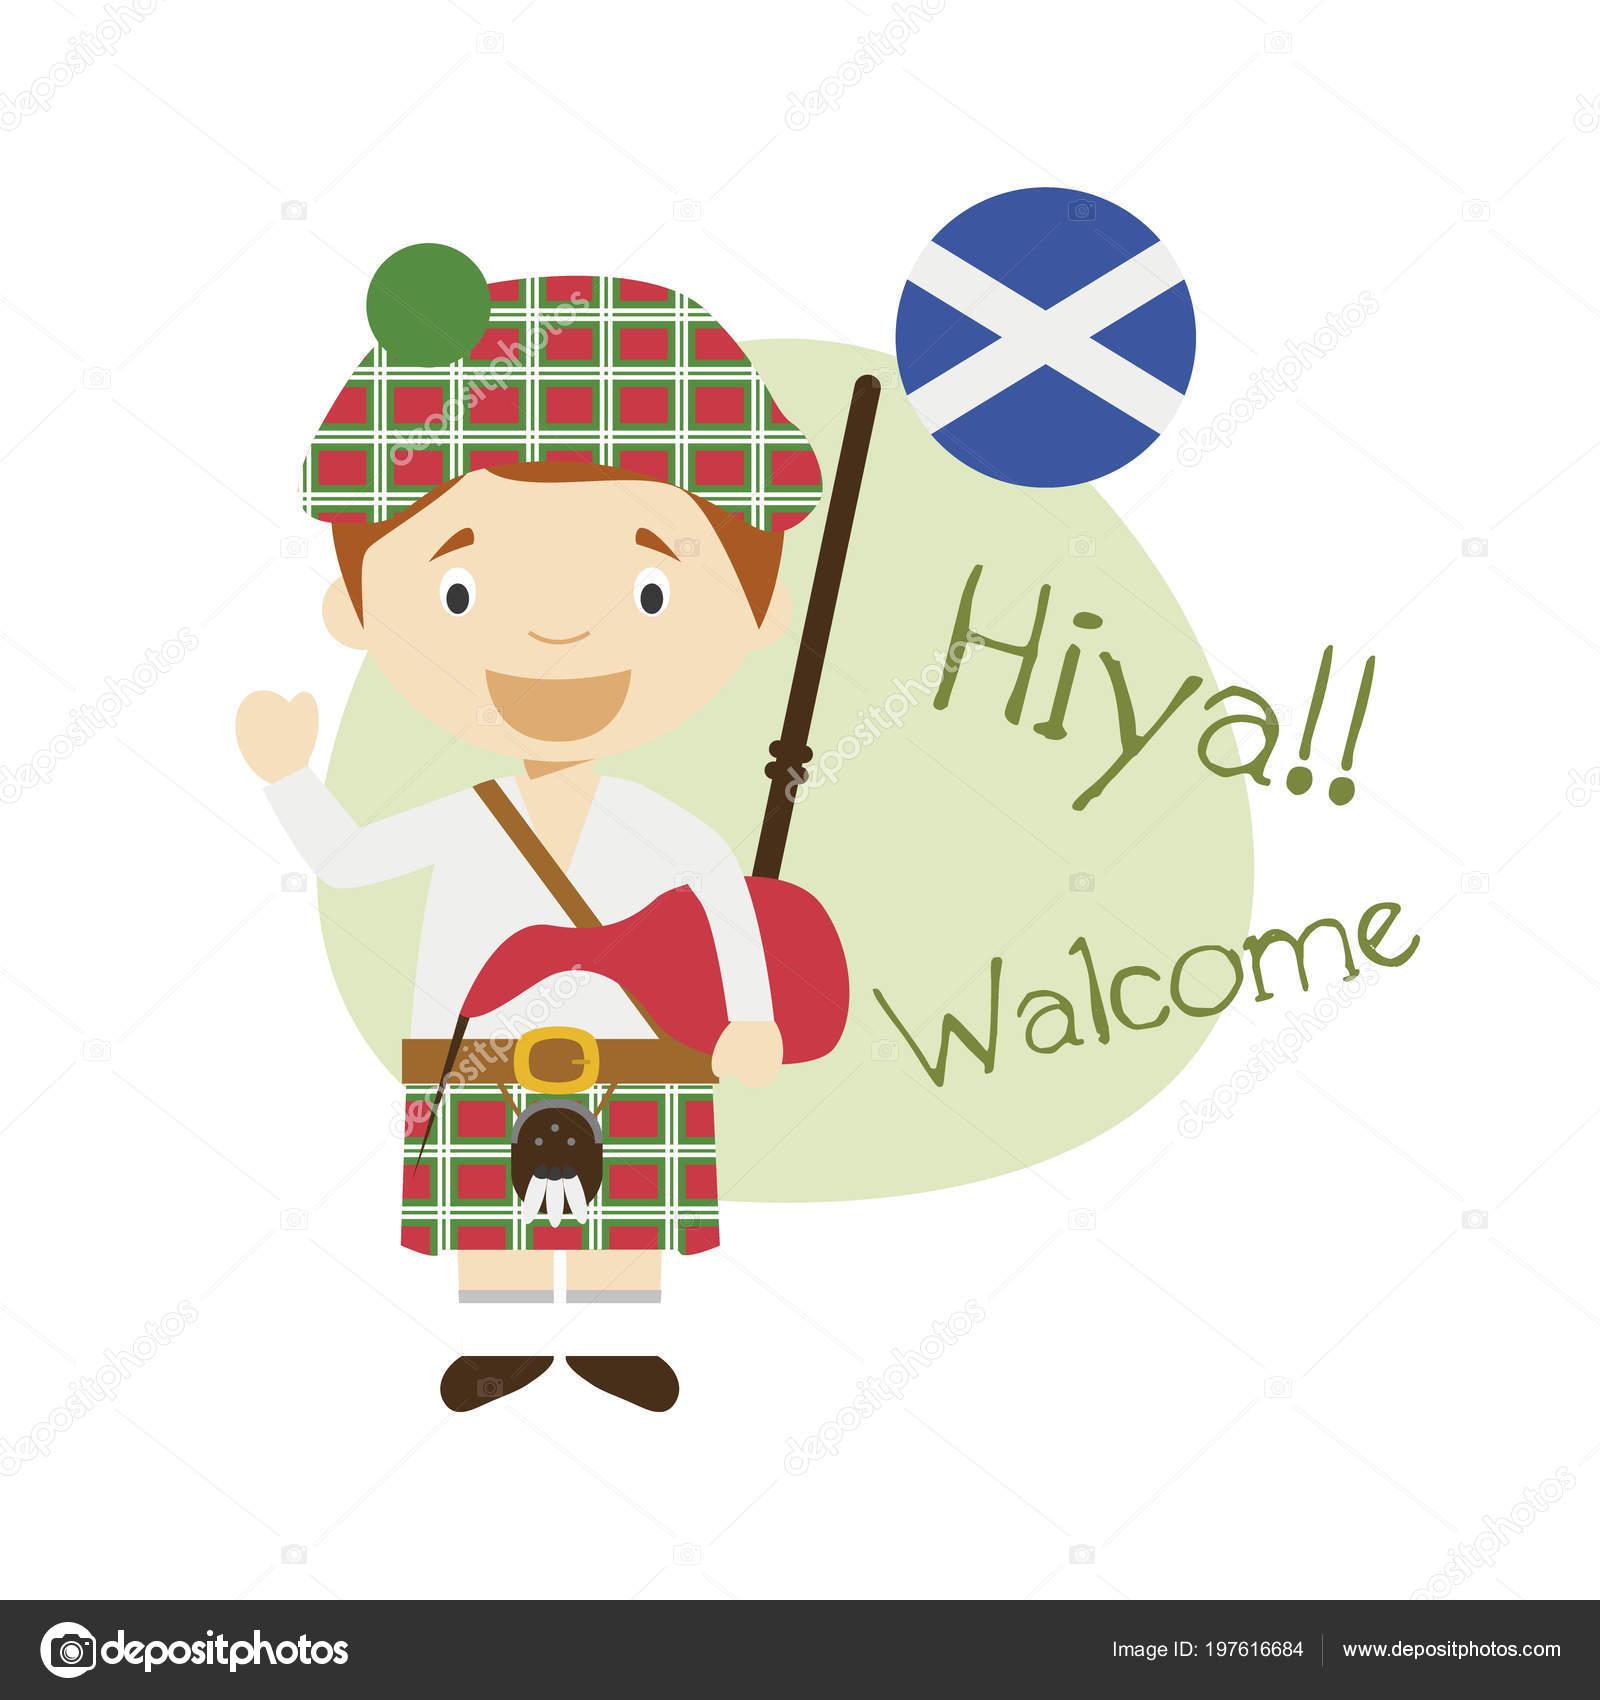 vector illustration cartoon character saying hello welcome scottish